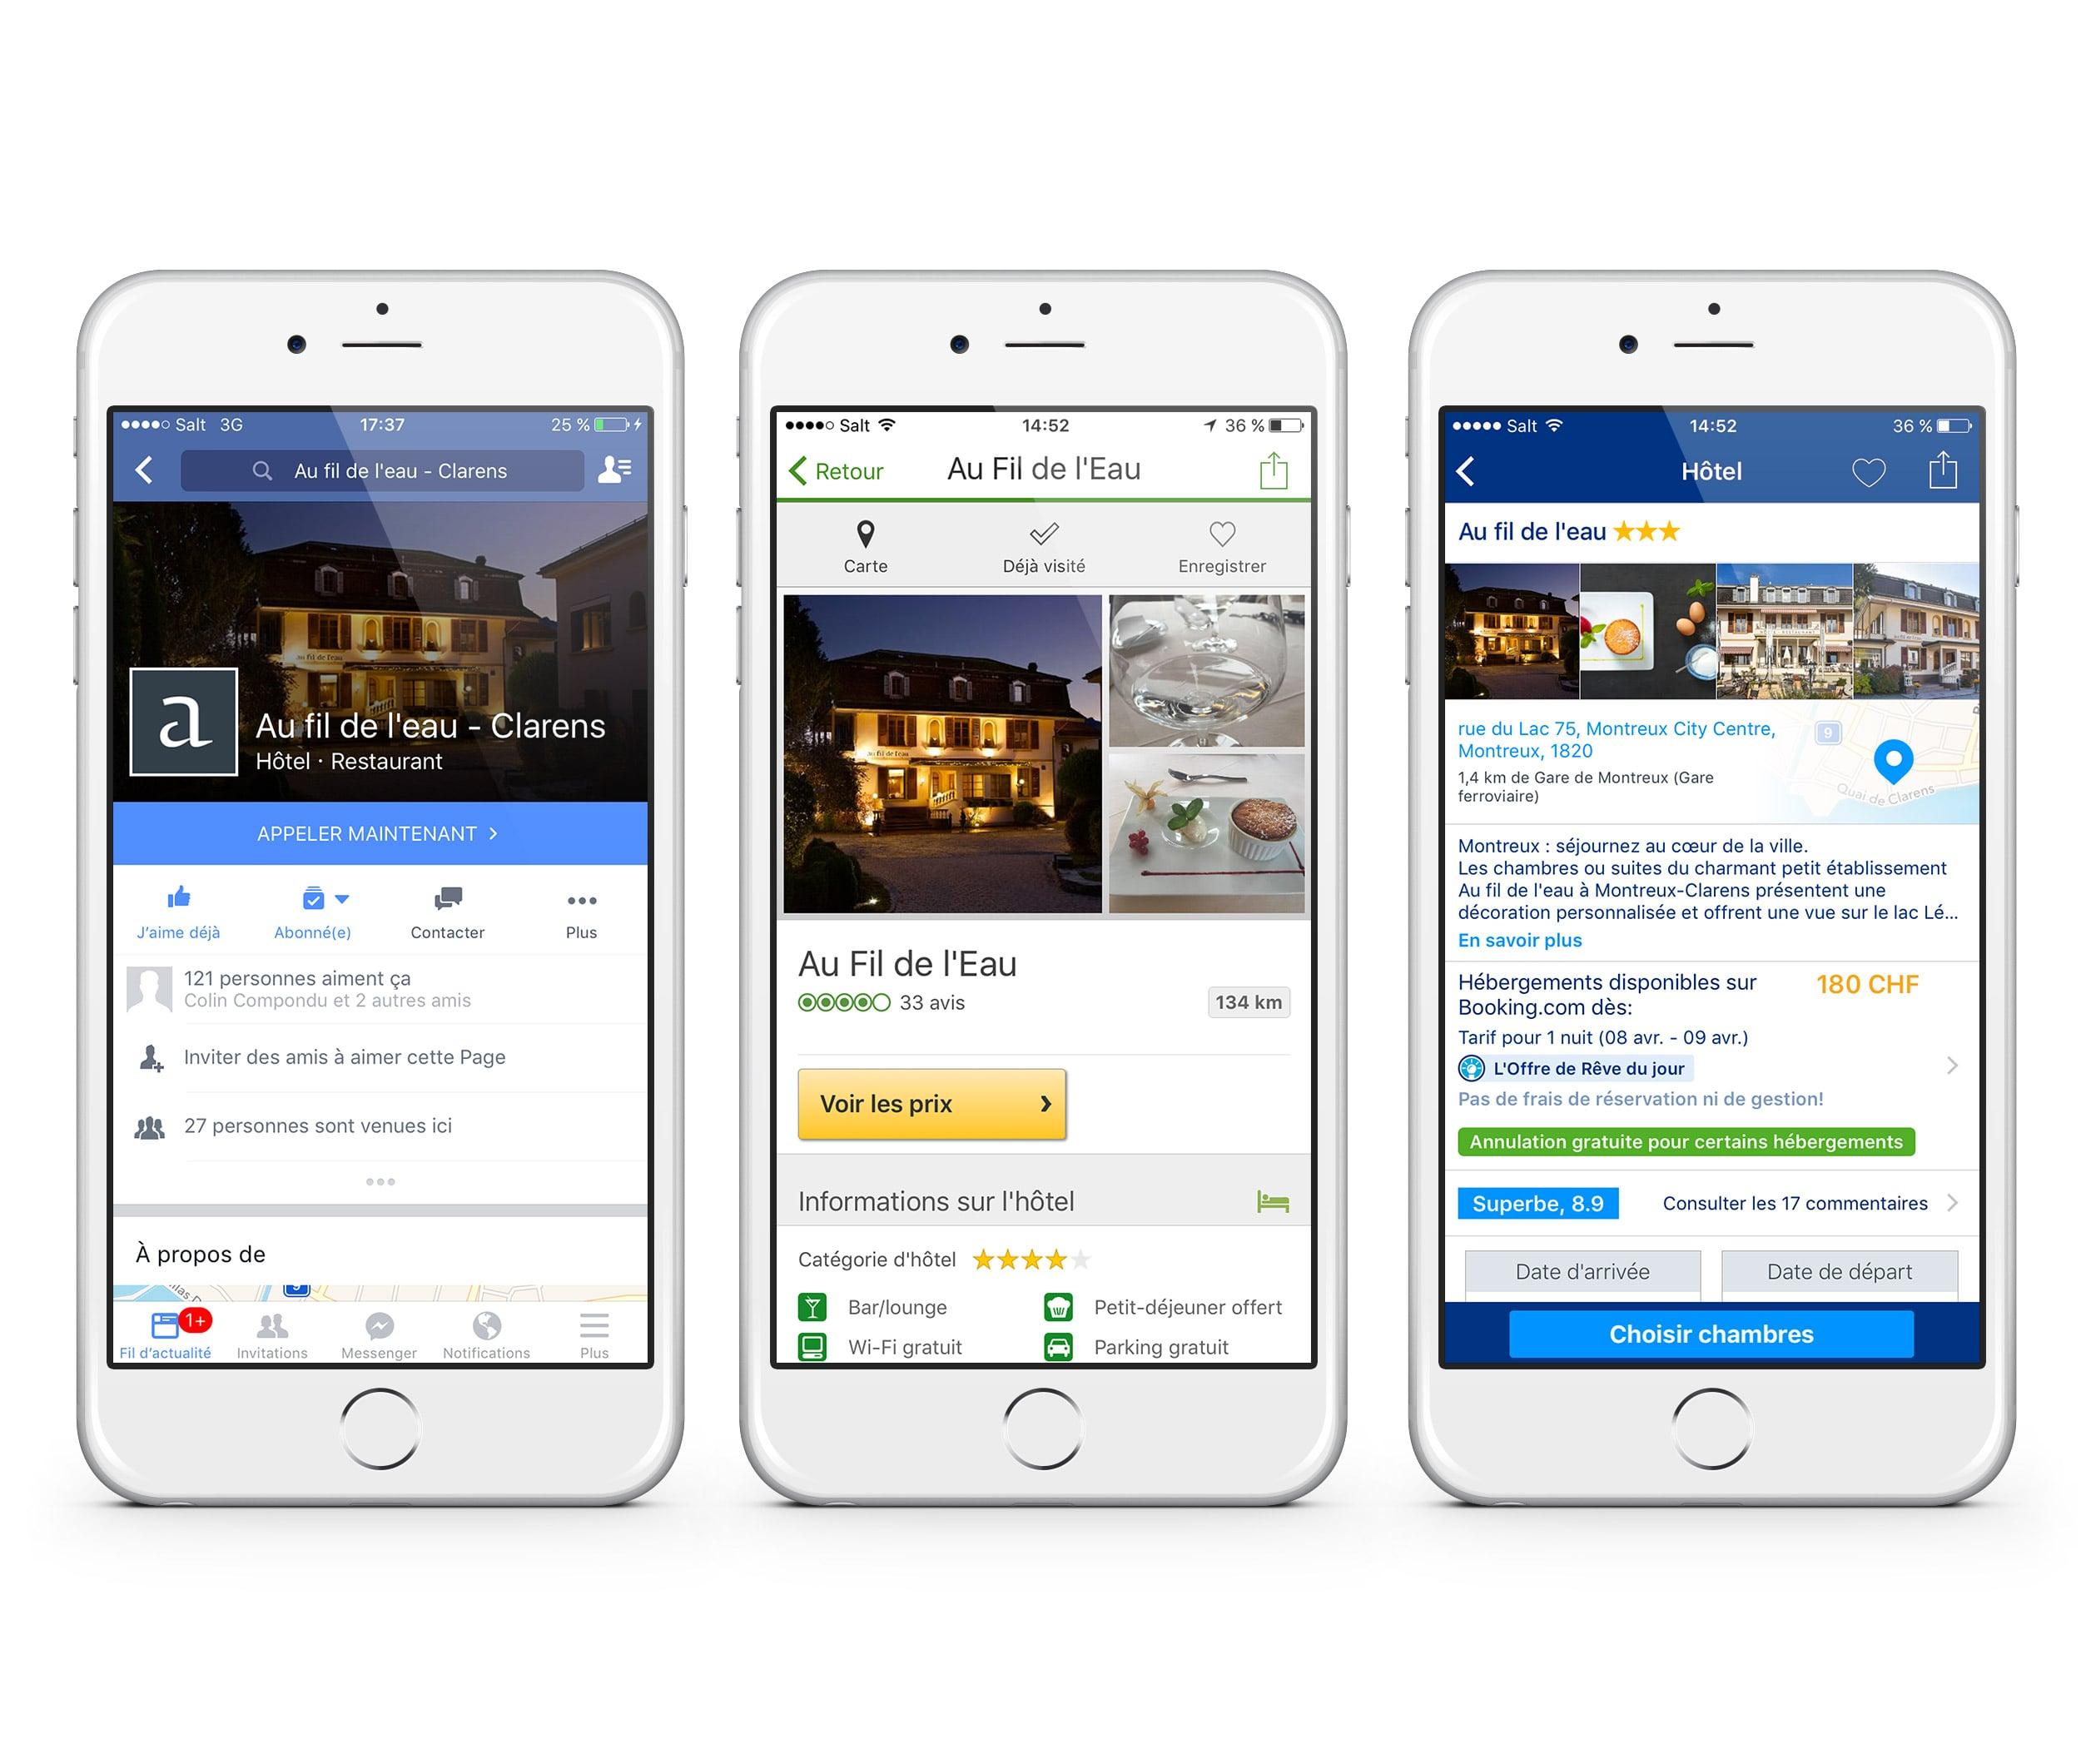 Au fil de l'eau on Facebook, TripAdvisor and Booking